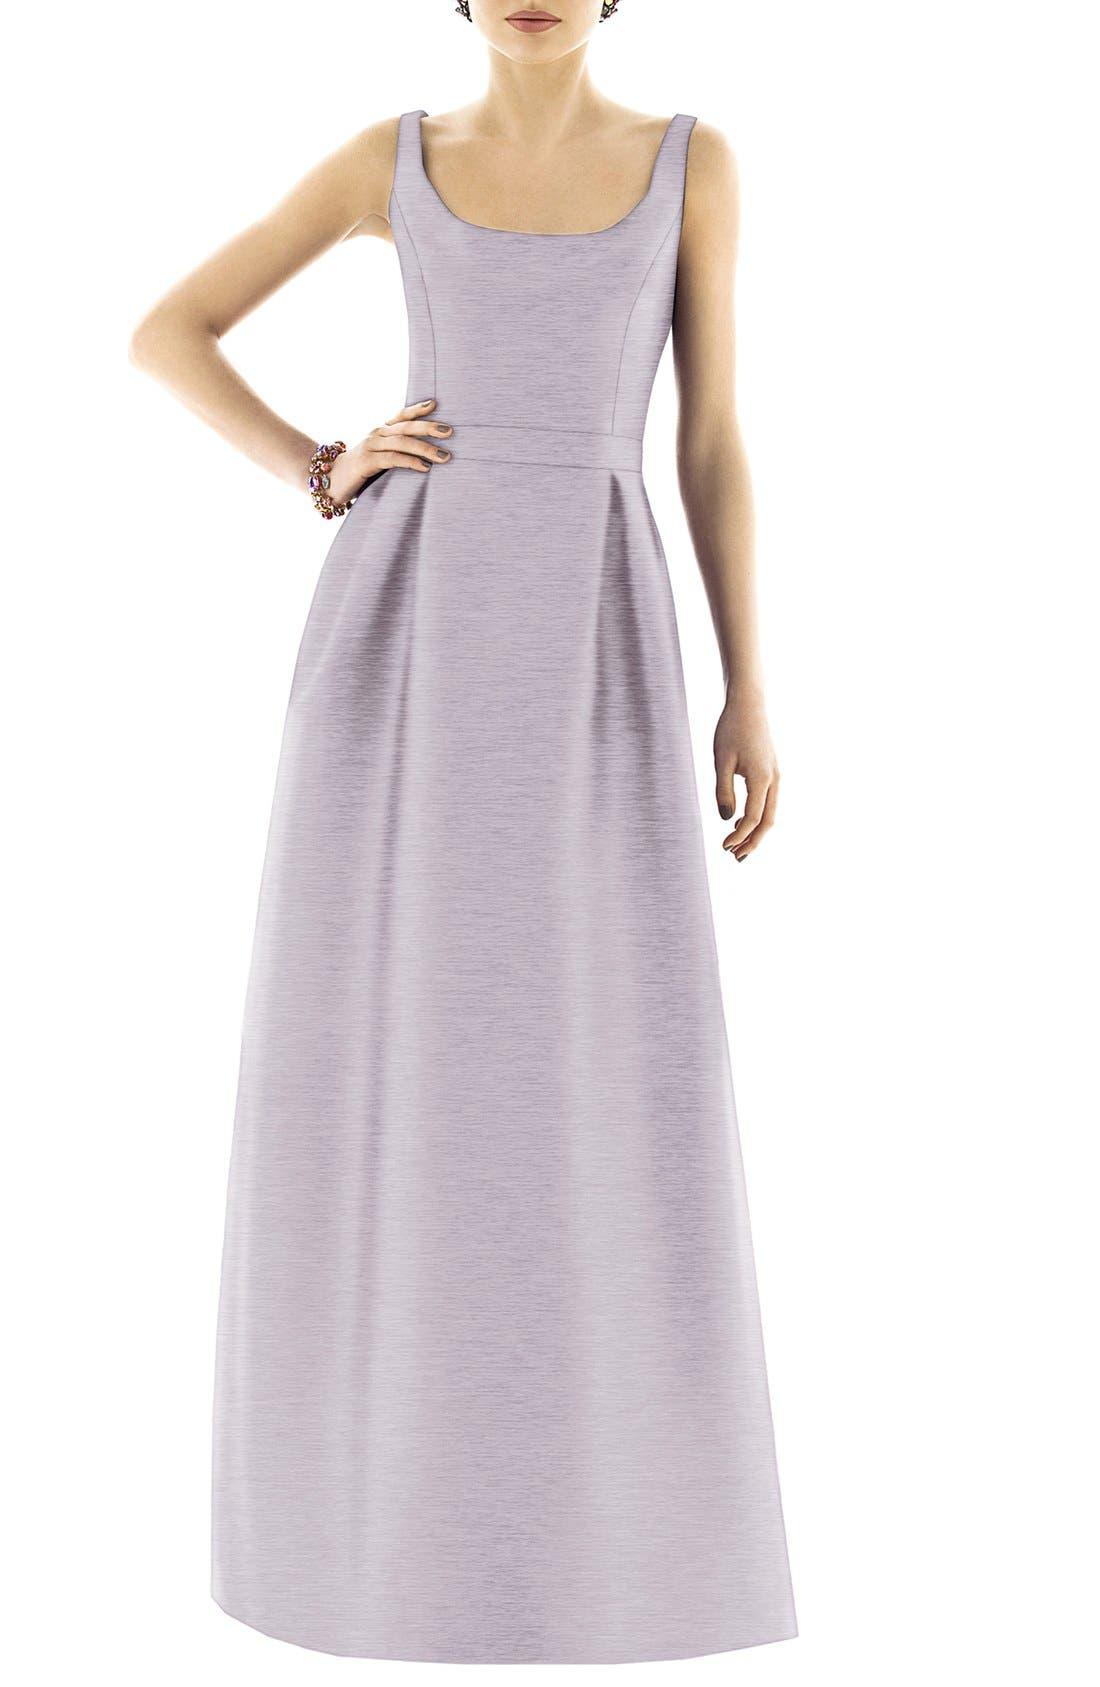 Scoop Neck Dupioni Full Length Dress,                             Alternate thumbnail 8, color,